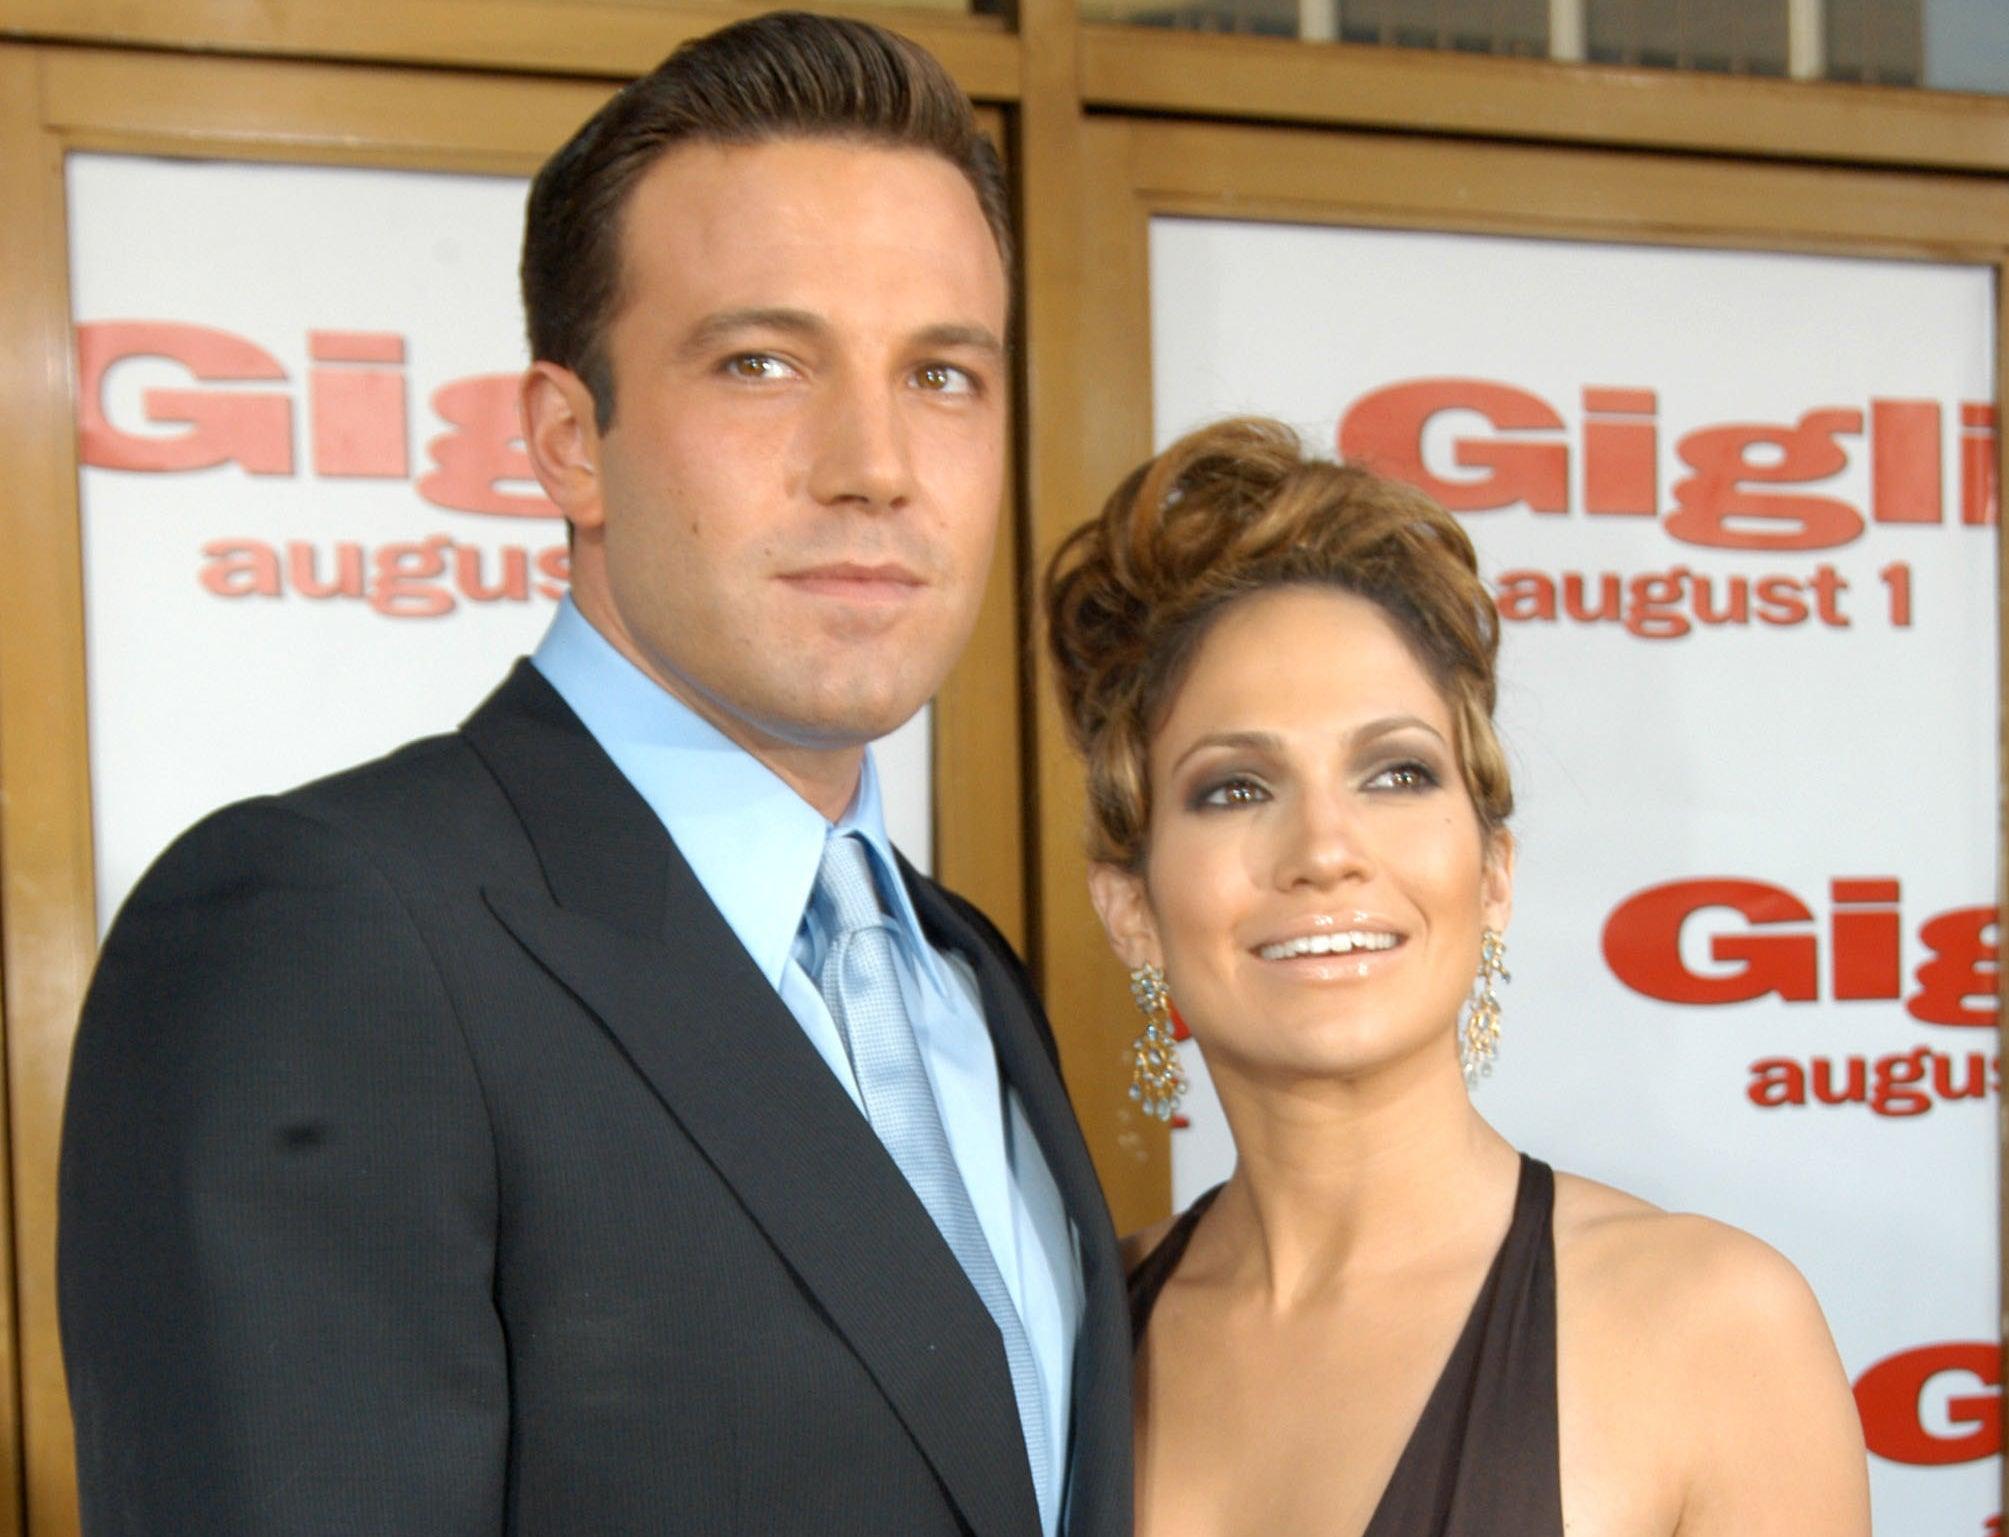 Jennifer smiles in an older photo standing next to Ben